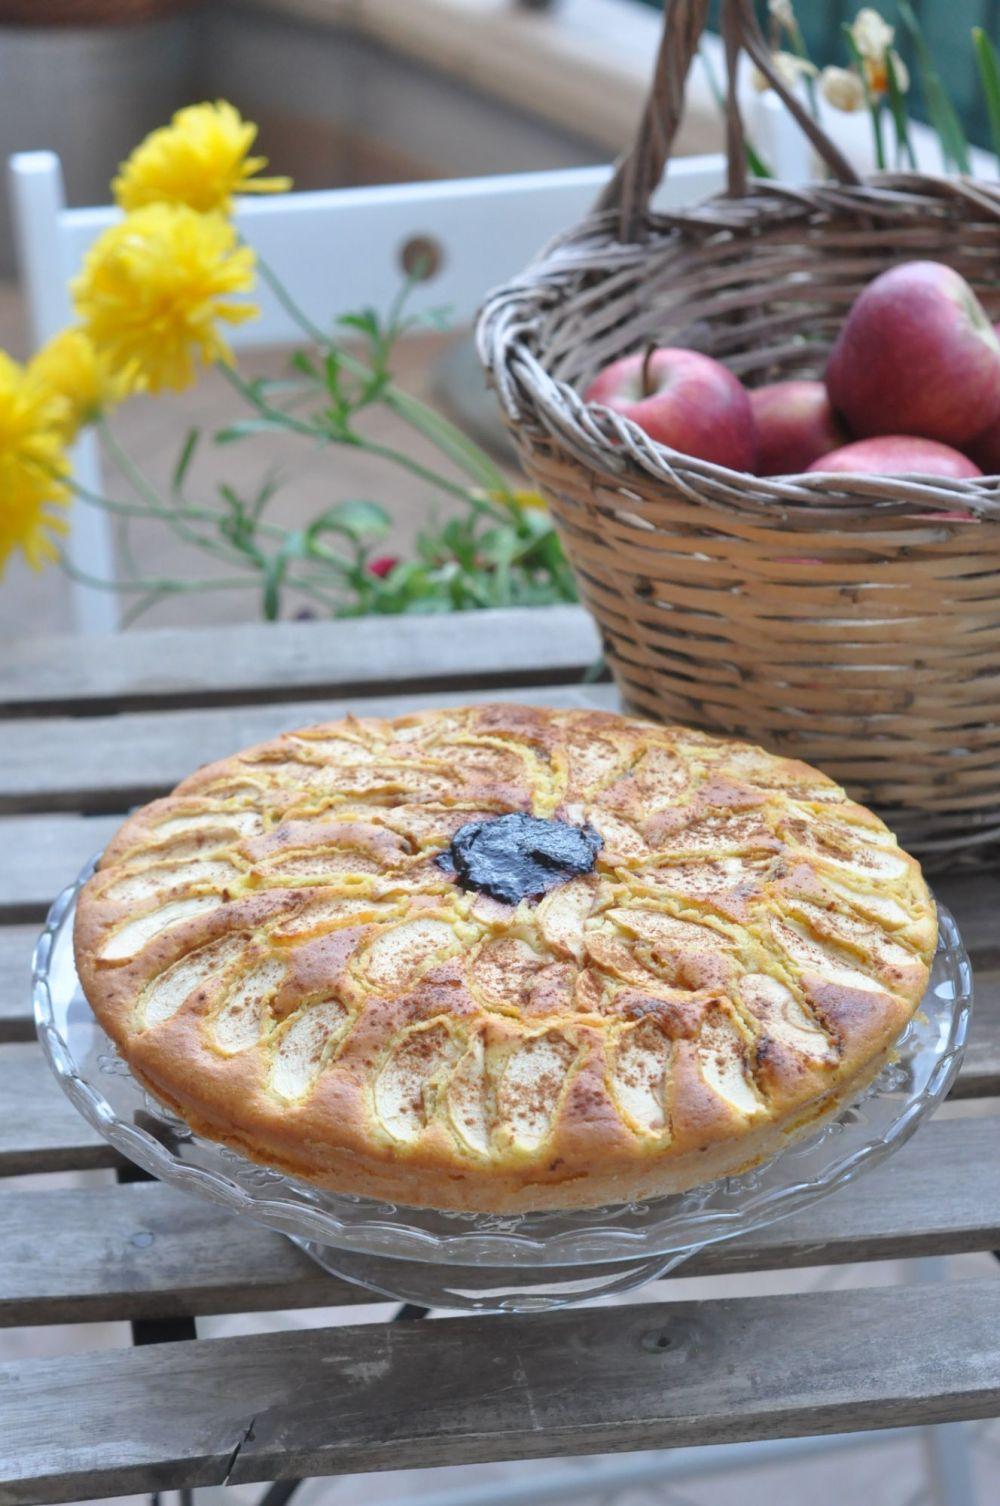 Torta al farro con mele e mirtilli